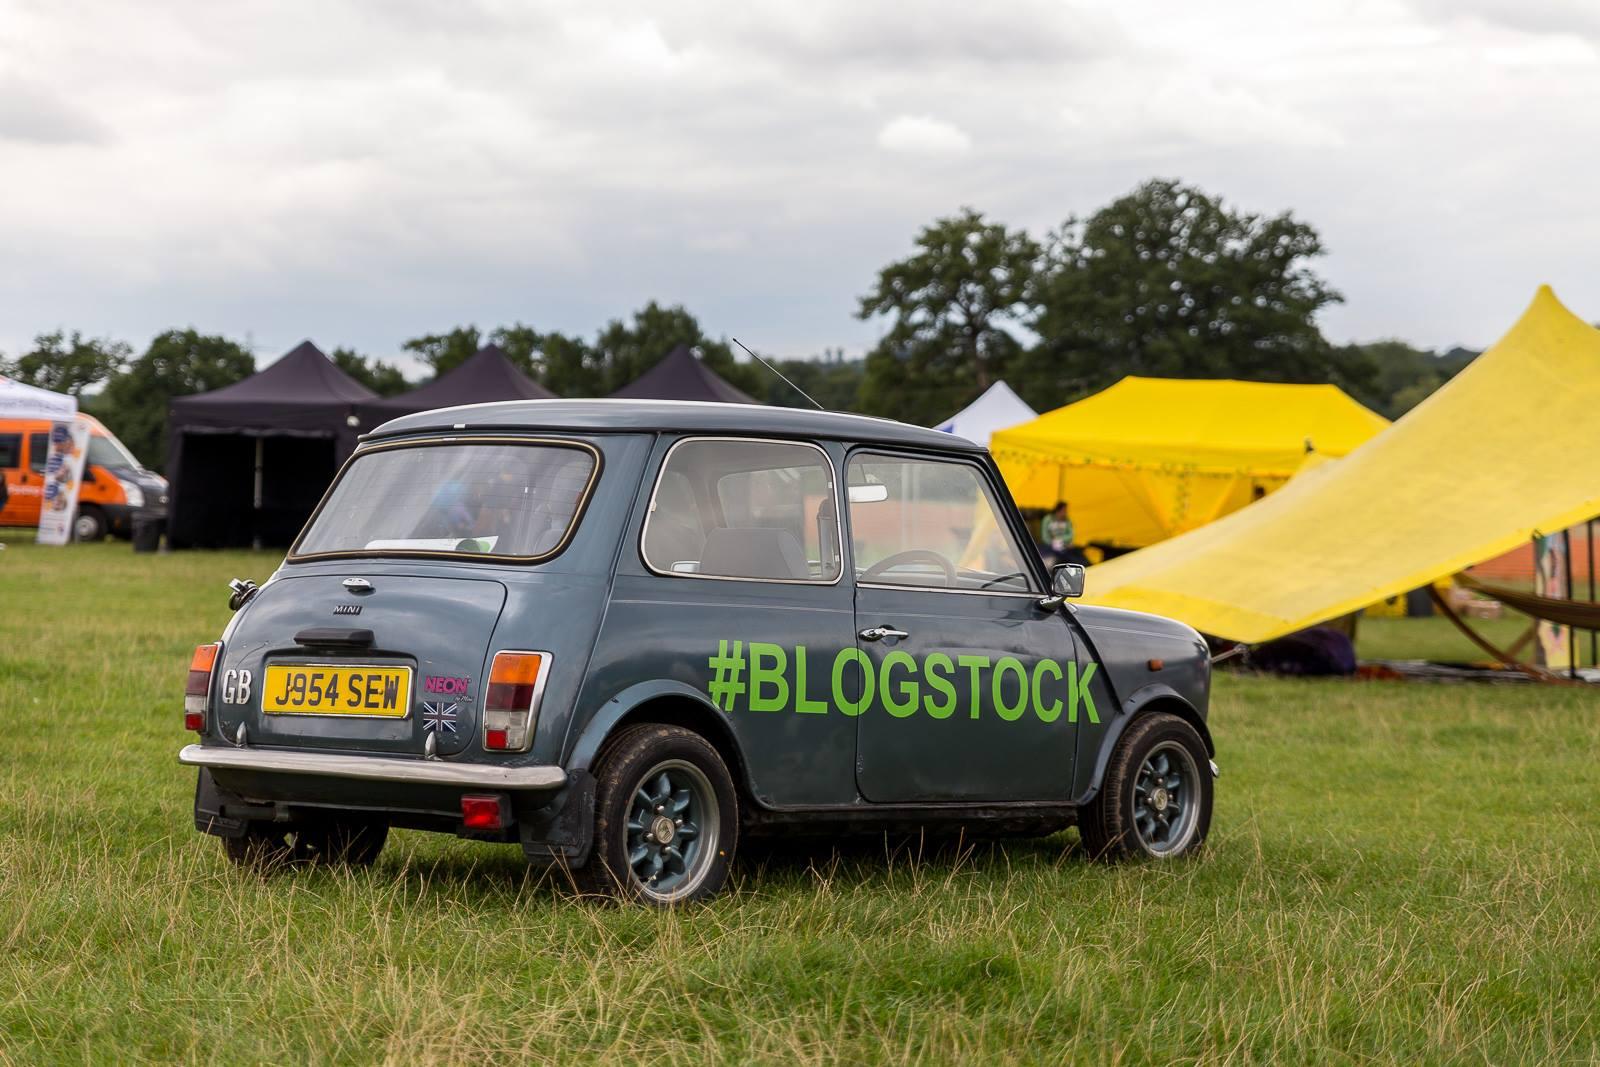 BlogStock car